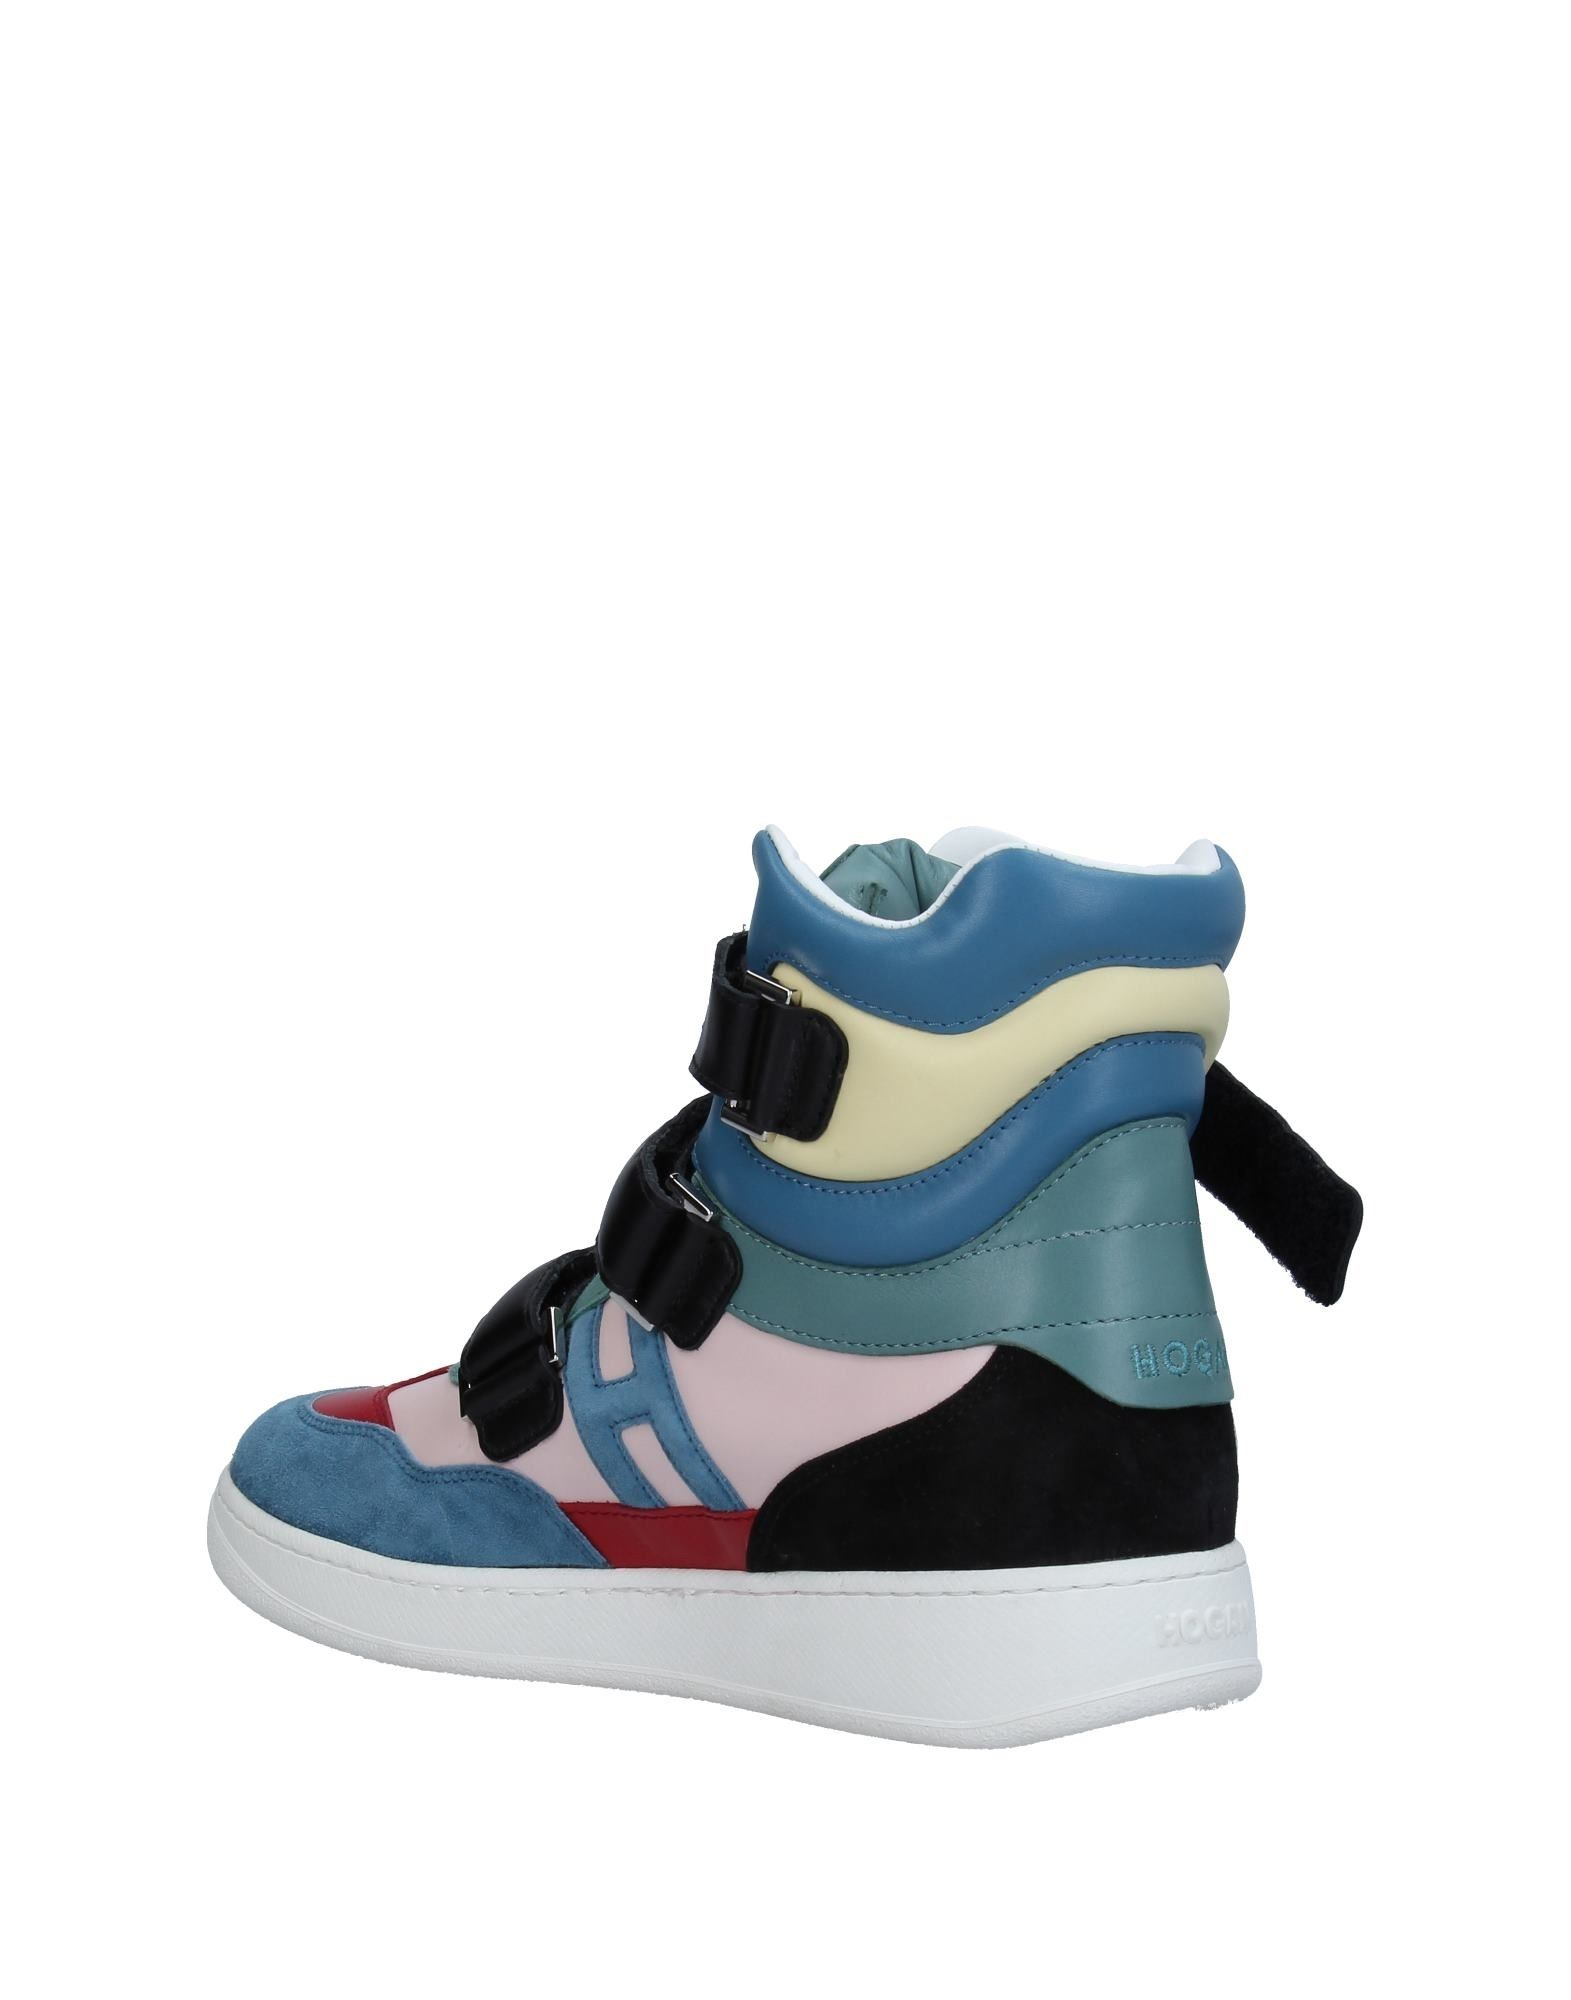 Katie Grand Loves Hogan aussehende Sneakers Damen  11337134AKGut aussehende Hogan strapazierfähige Schuhe 048281